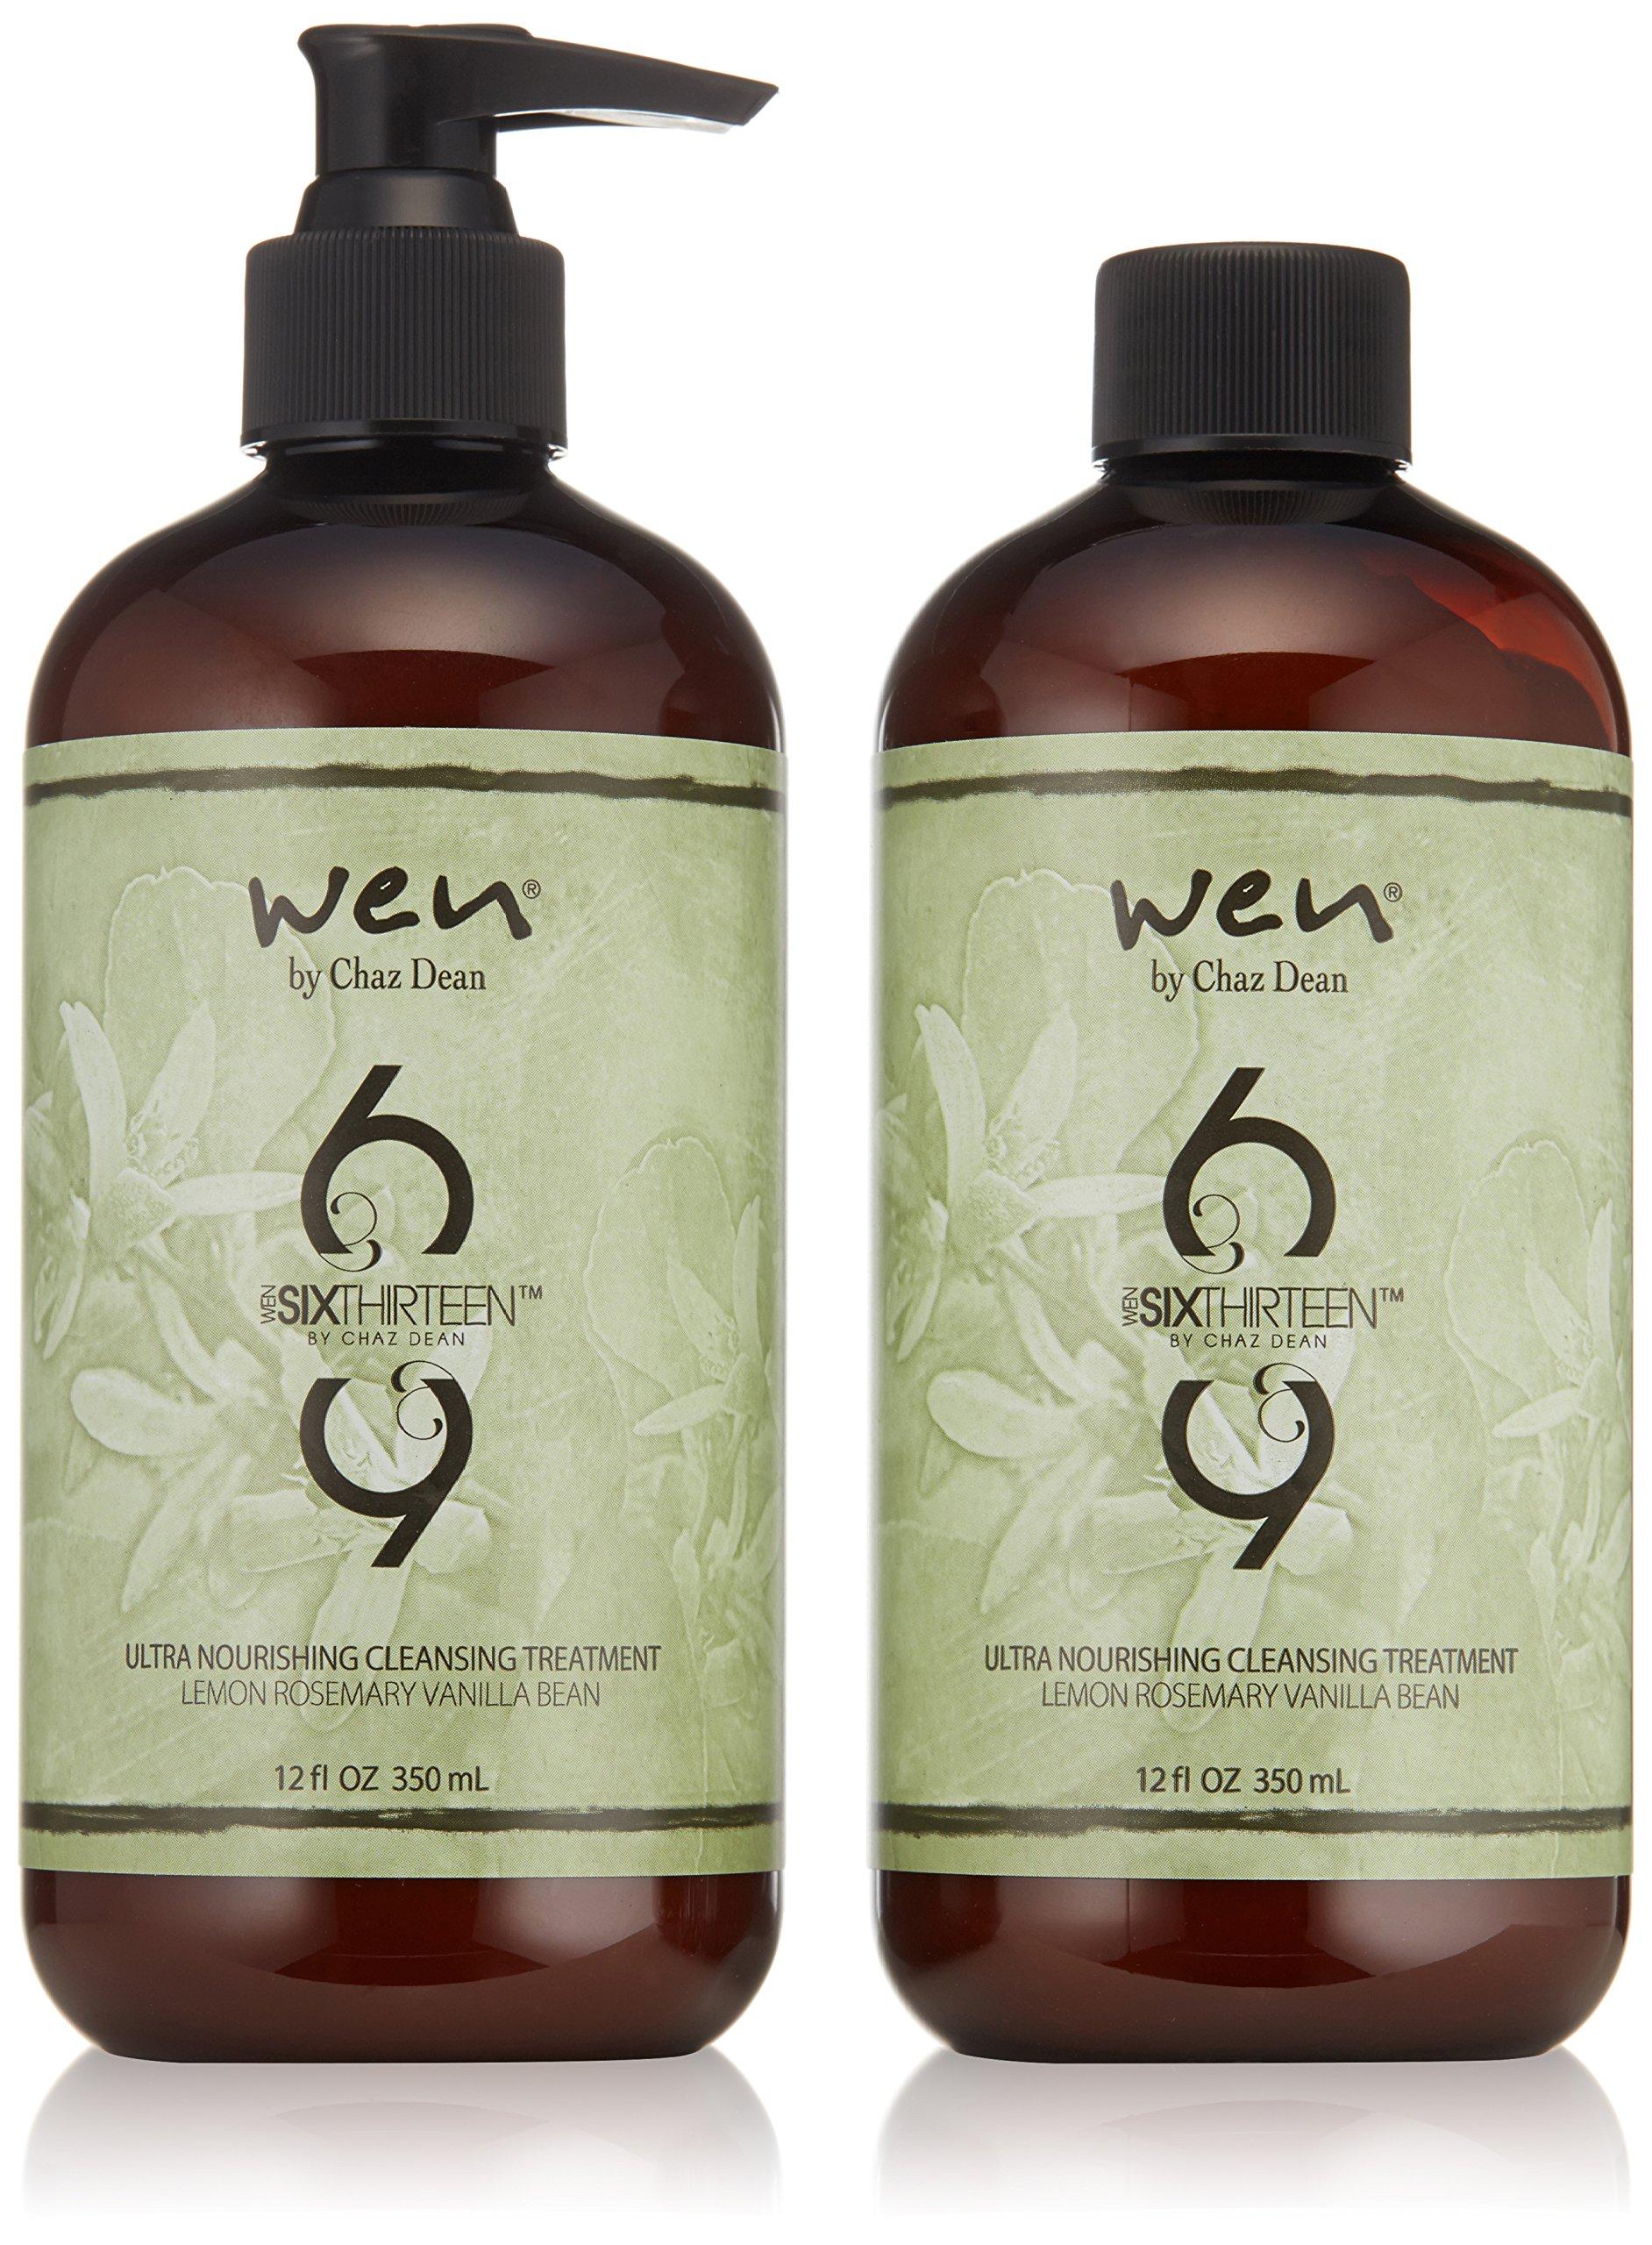 WEN by Chaz Dean Six Thirteen Ultra Nourishing Cleansing Treatment Duo, 24 fl. oz.